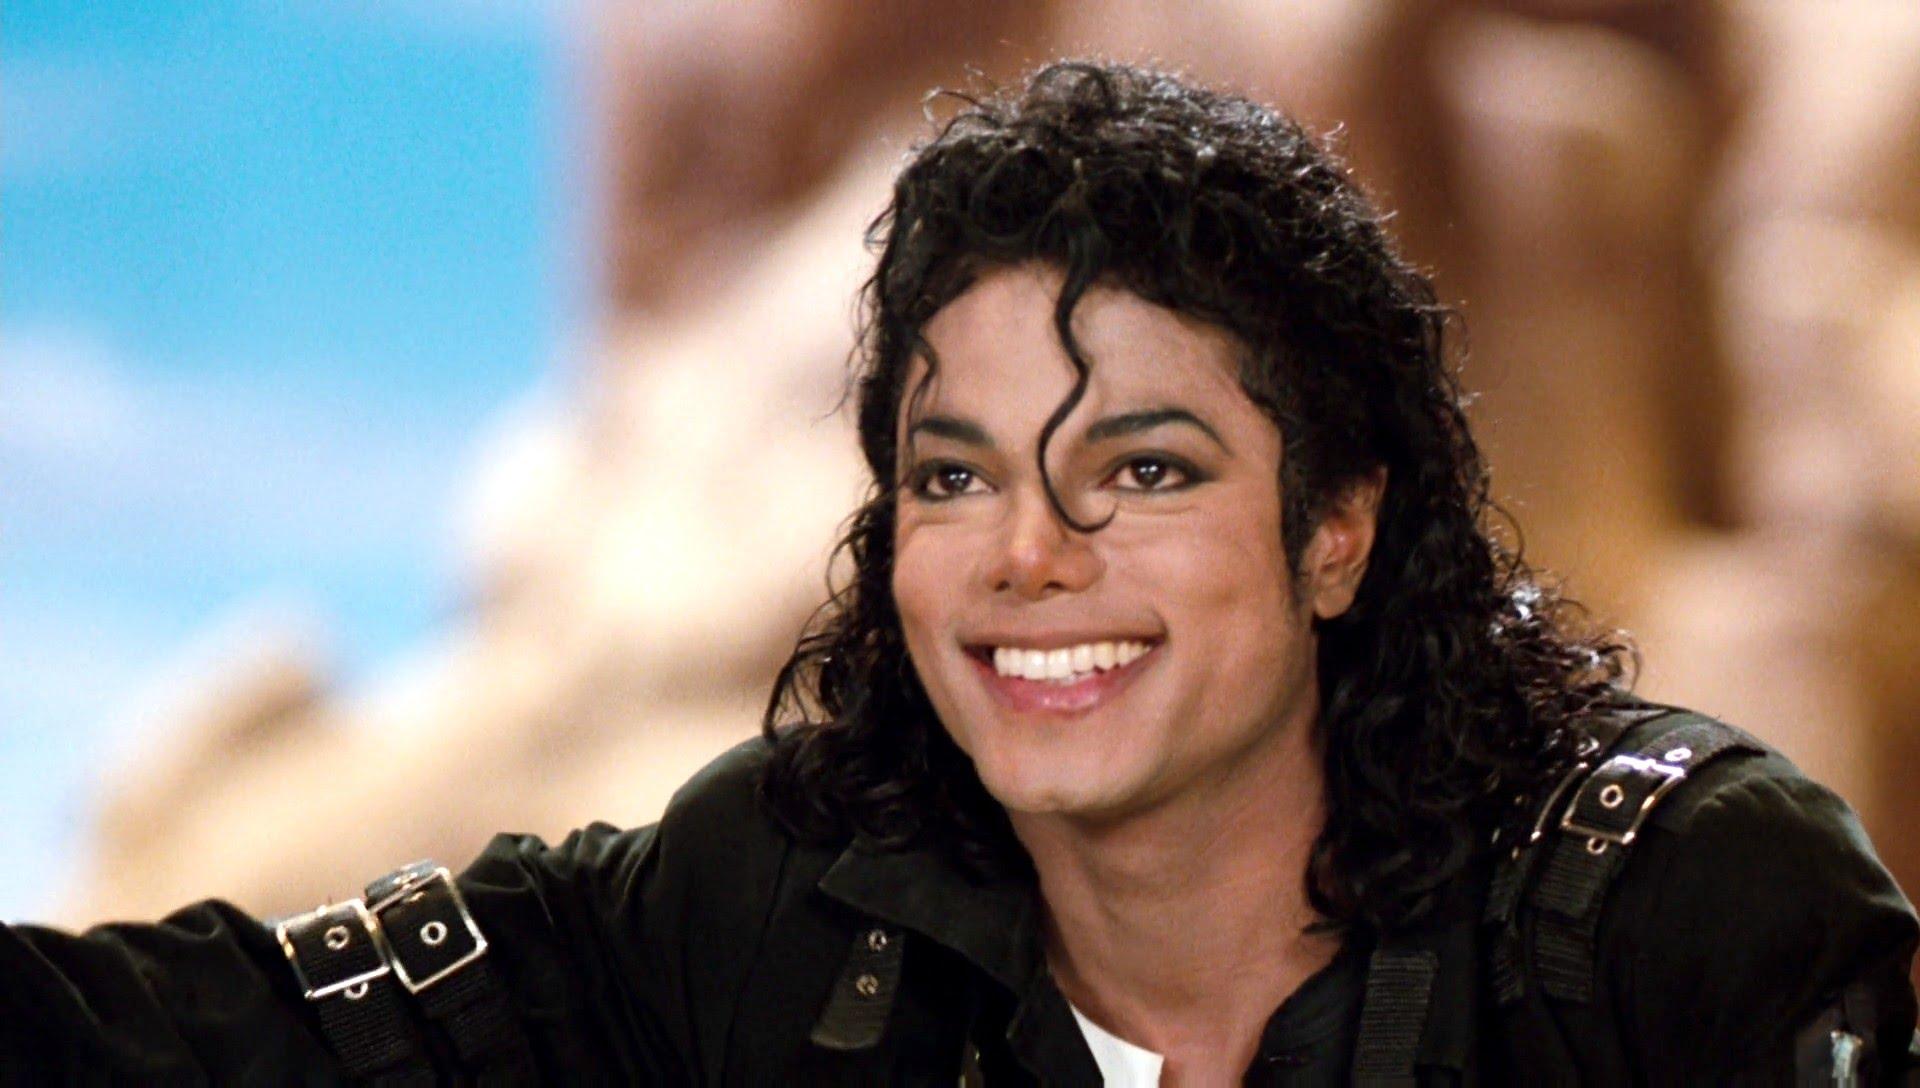 Michael Jackson from Speed Demon video.